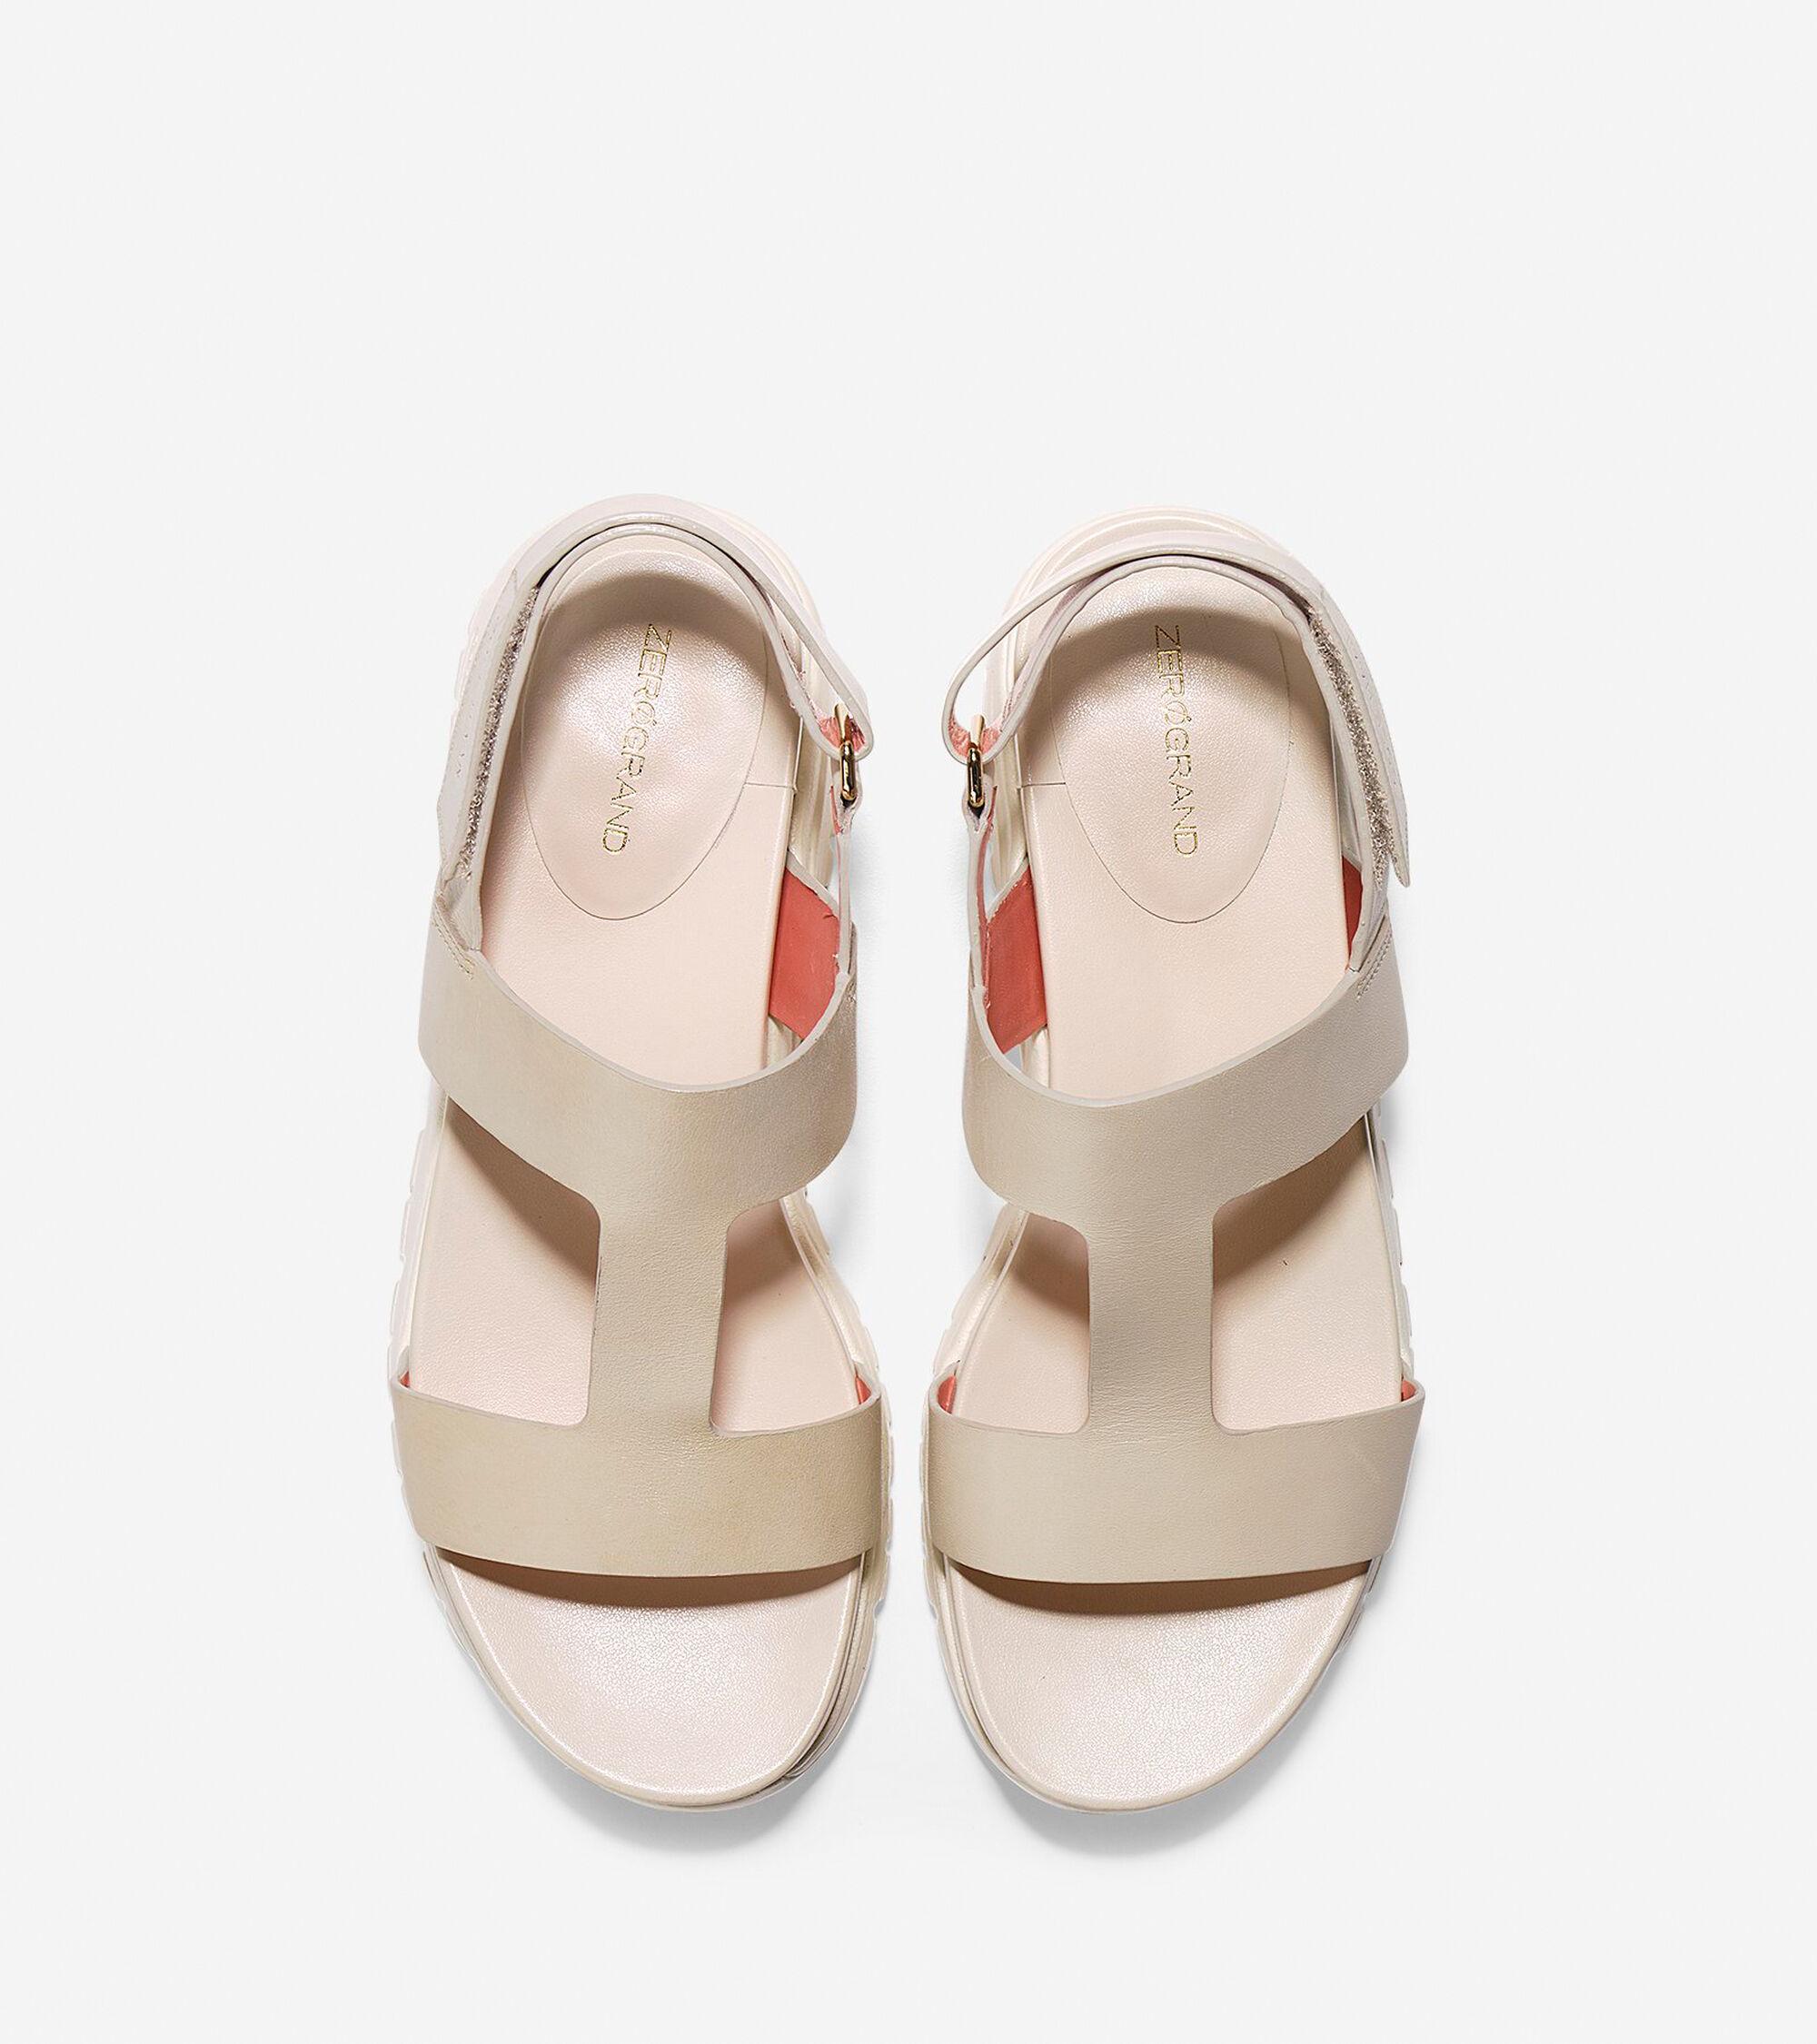 8147c4d4ef0 ZEROGRAND T-Strap Sandals in Sandshell Ivory